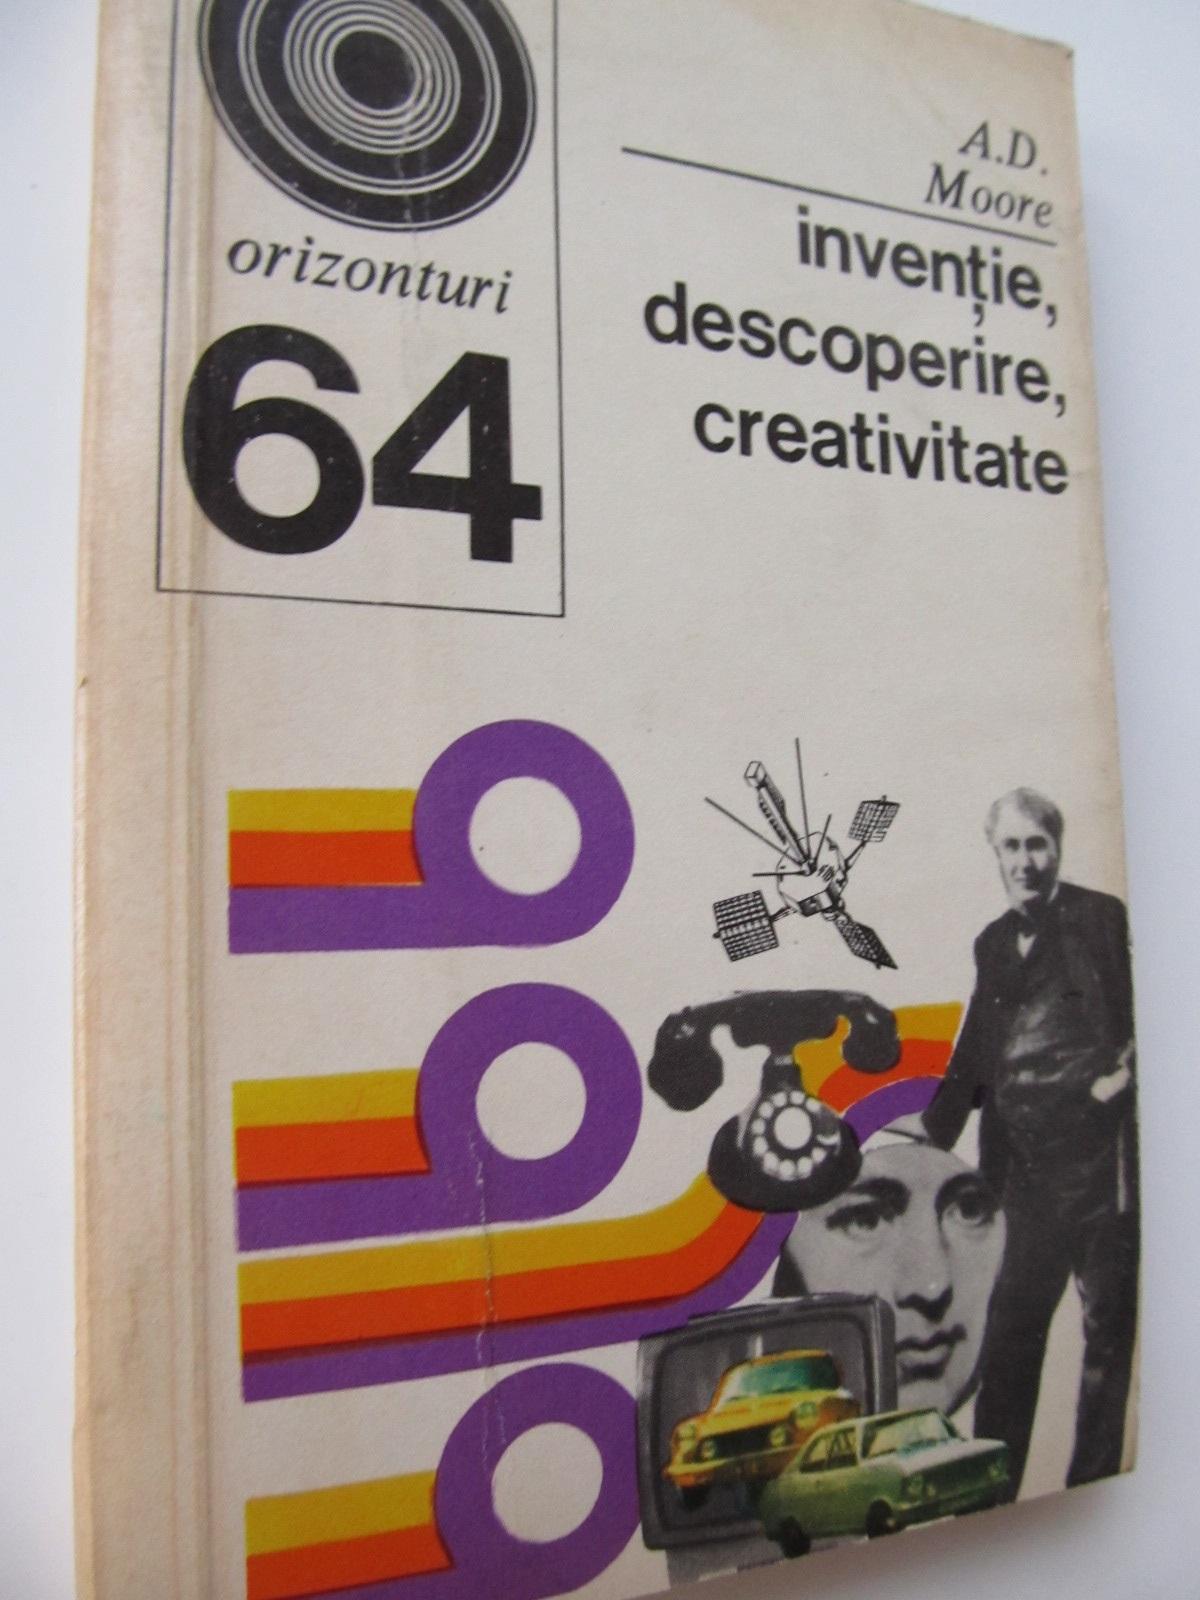 Inventie descoperire creativitate - A. D. Moore   Detalii carte